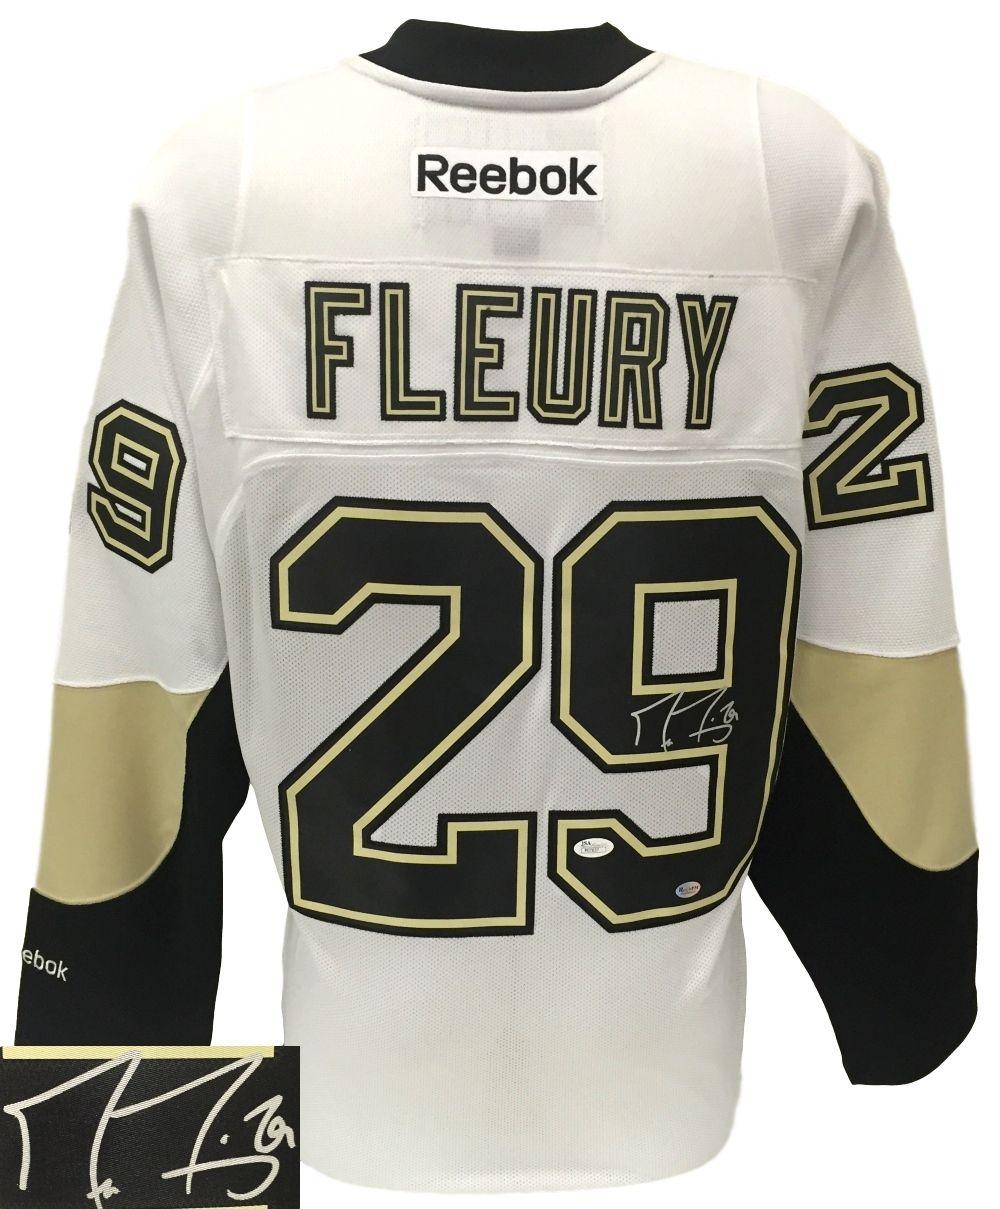 6497276b4 ... free shipping marc andre fleury signed pittsburgh penguins white reebok premier  jersey jsa sports integrity 04f6b